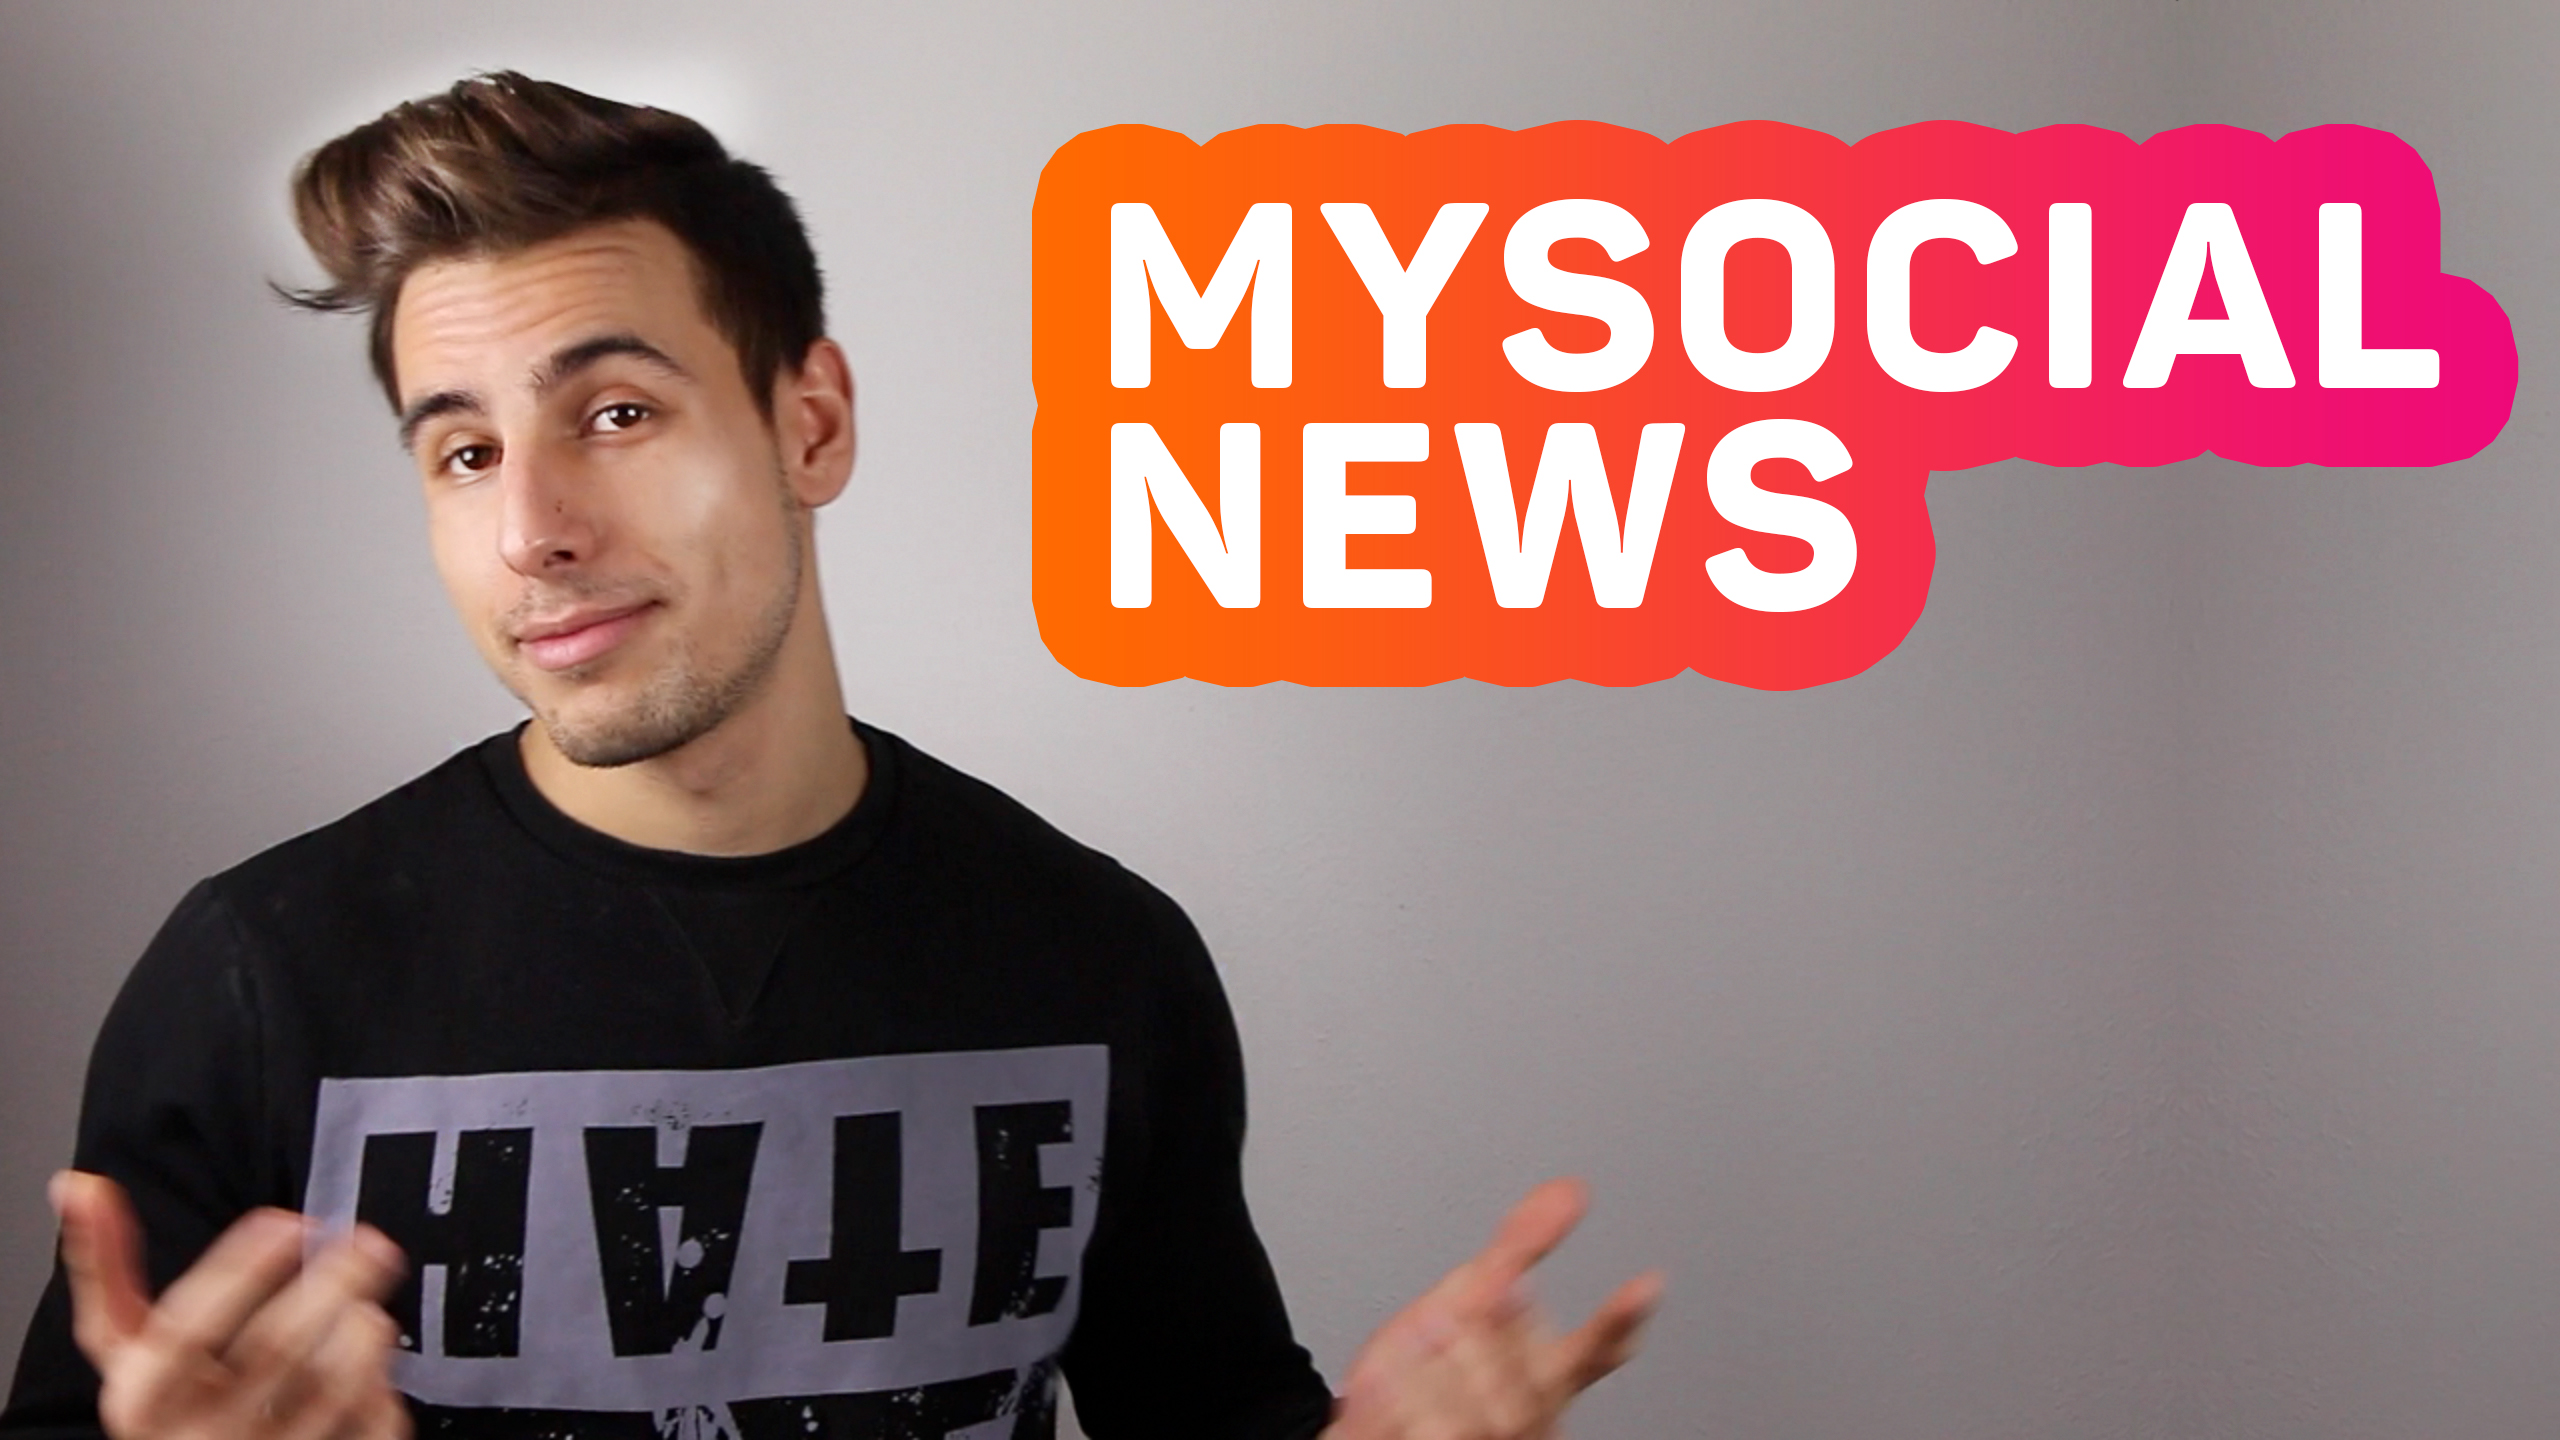 Facebook monetizes Creator platform, Shopping on Instagram expands: Mysocial News